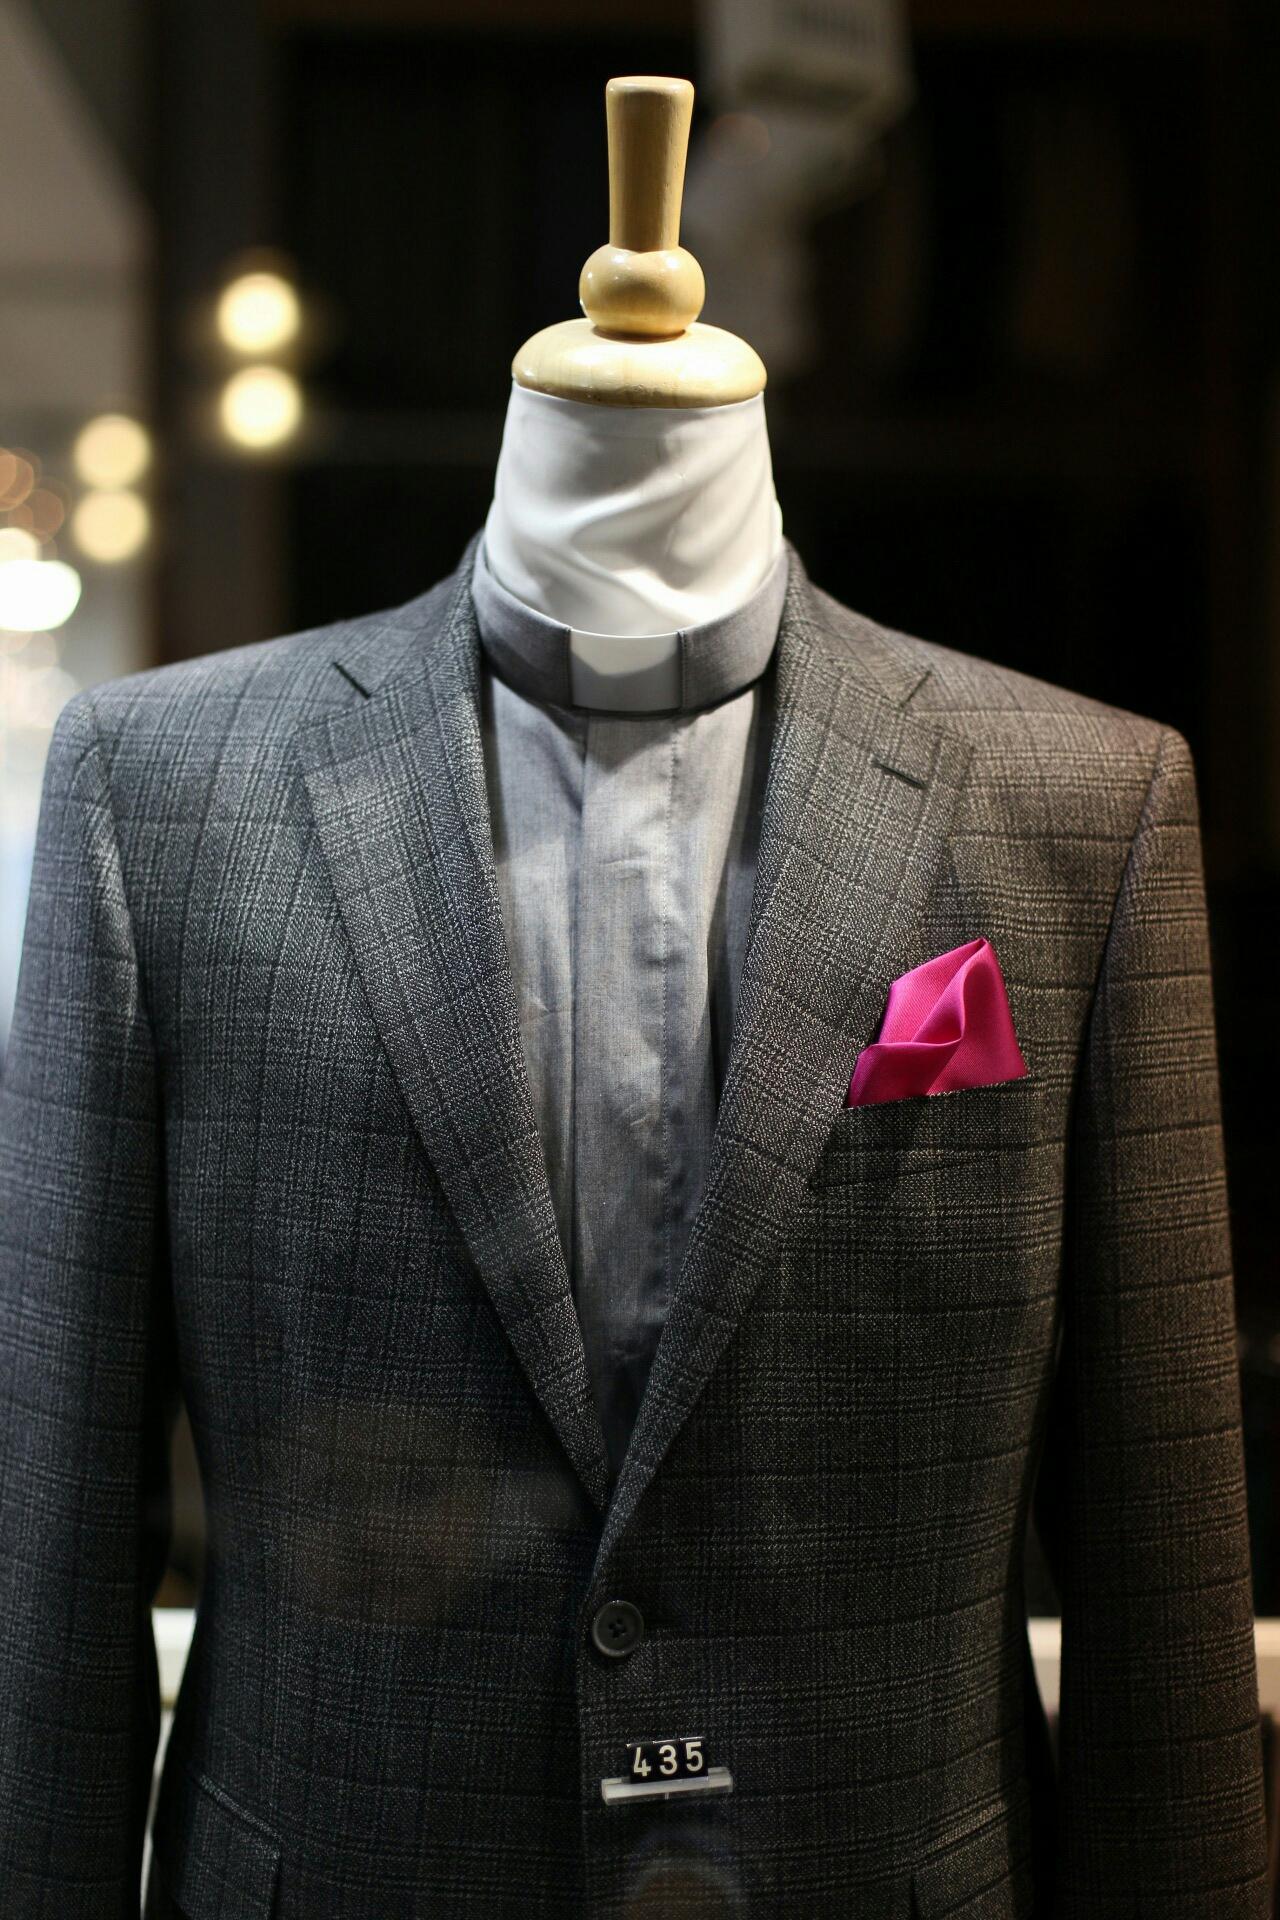 Pimp priest suit